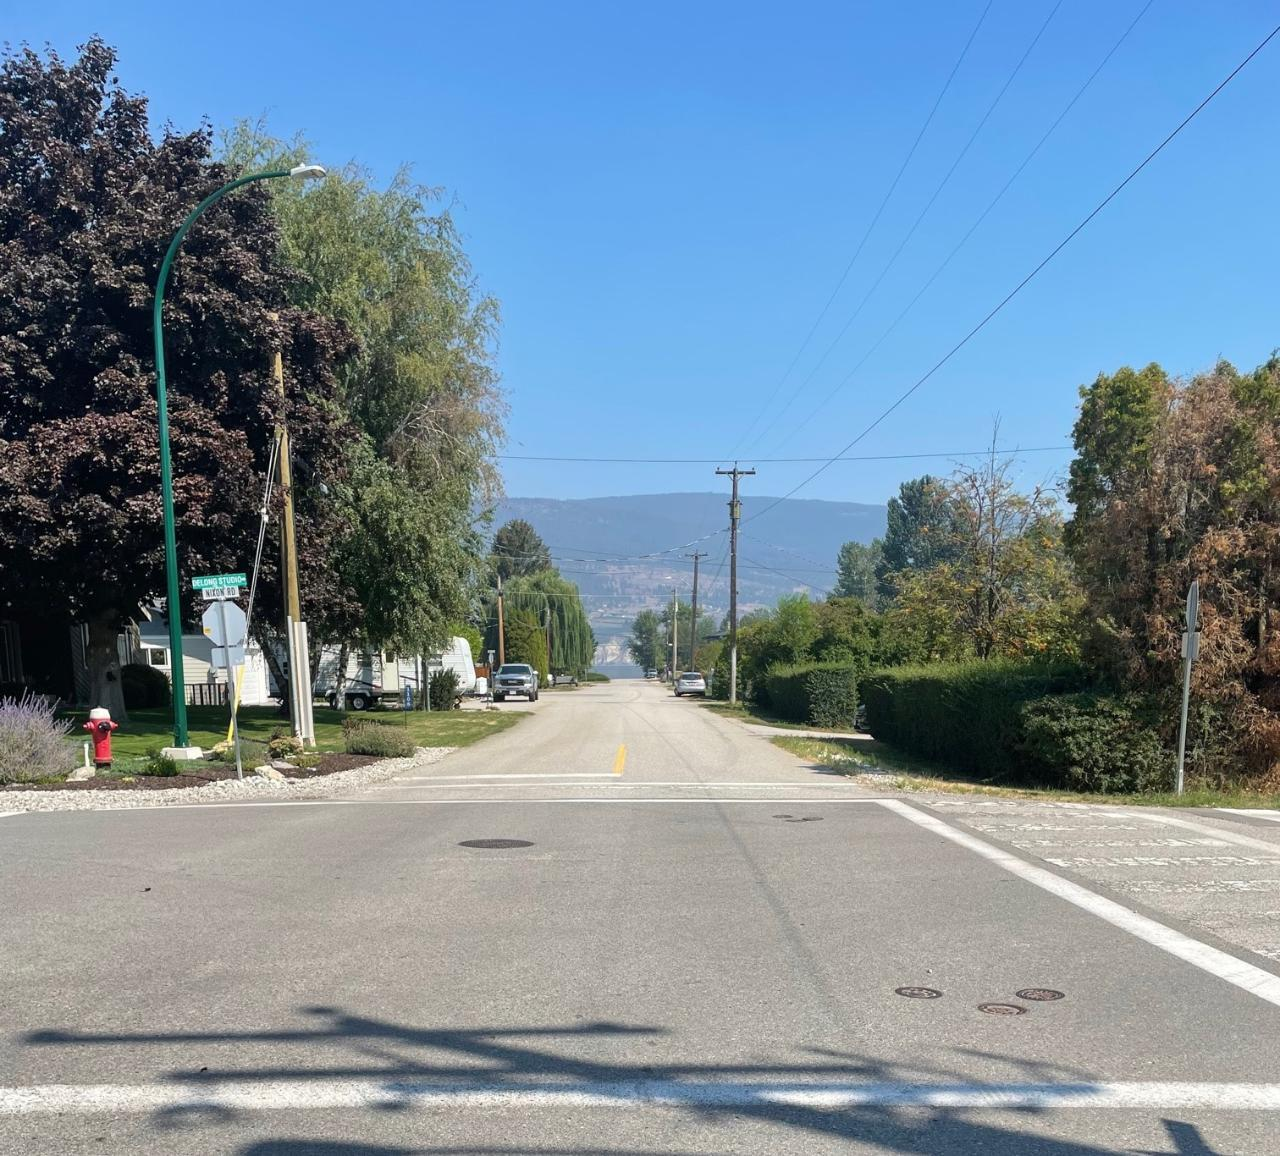 5587 Britton Road,, Summerland, British Columbia  V0H 1Z9 - Photo 2 - 190926